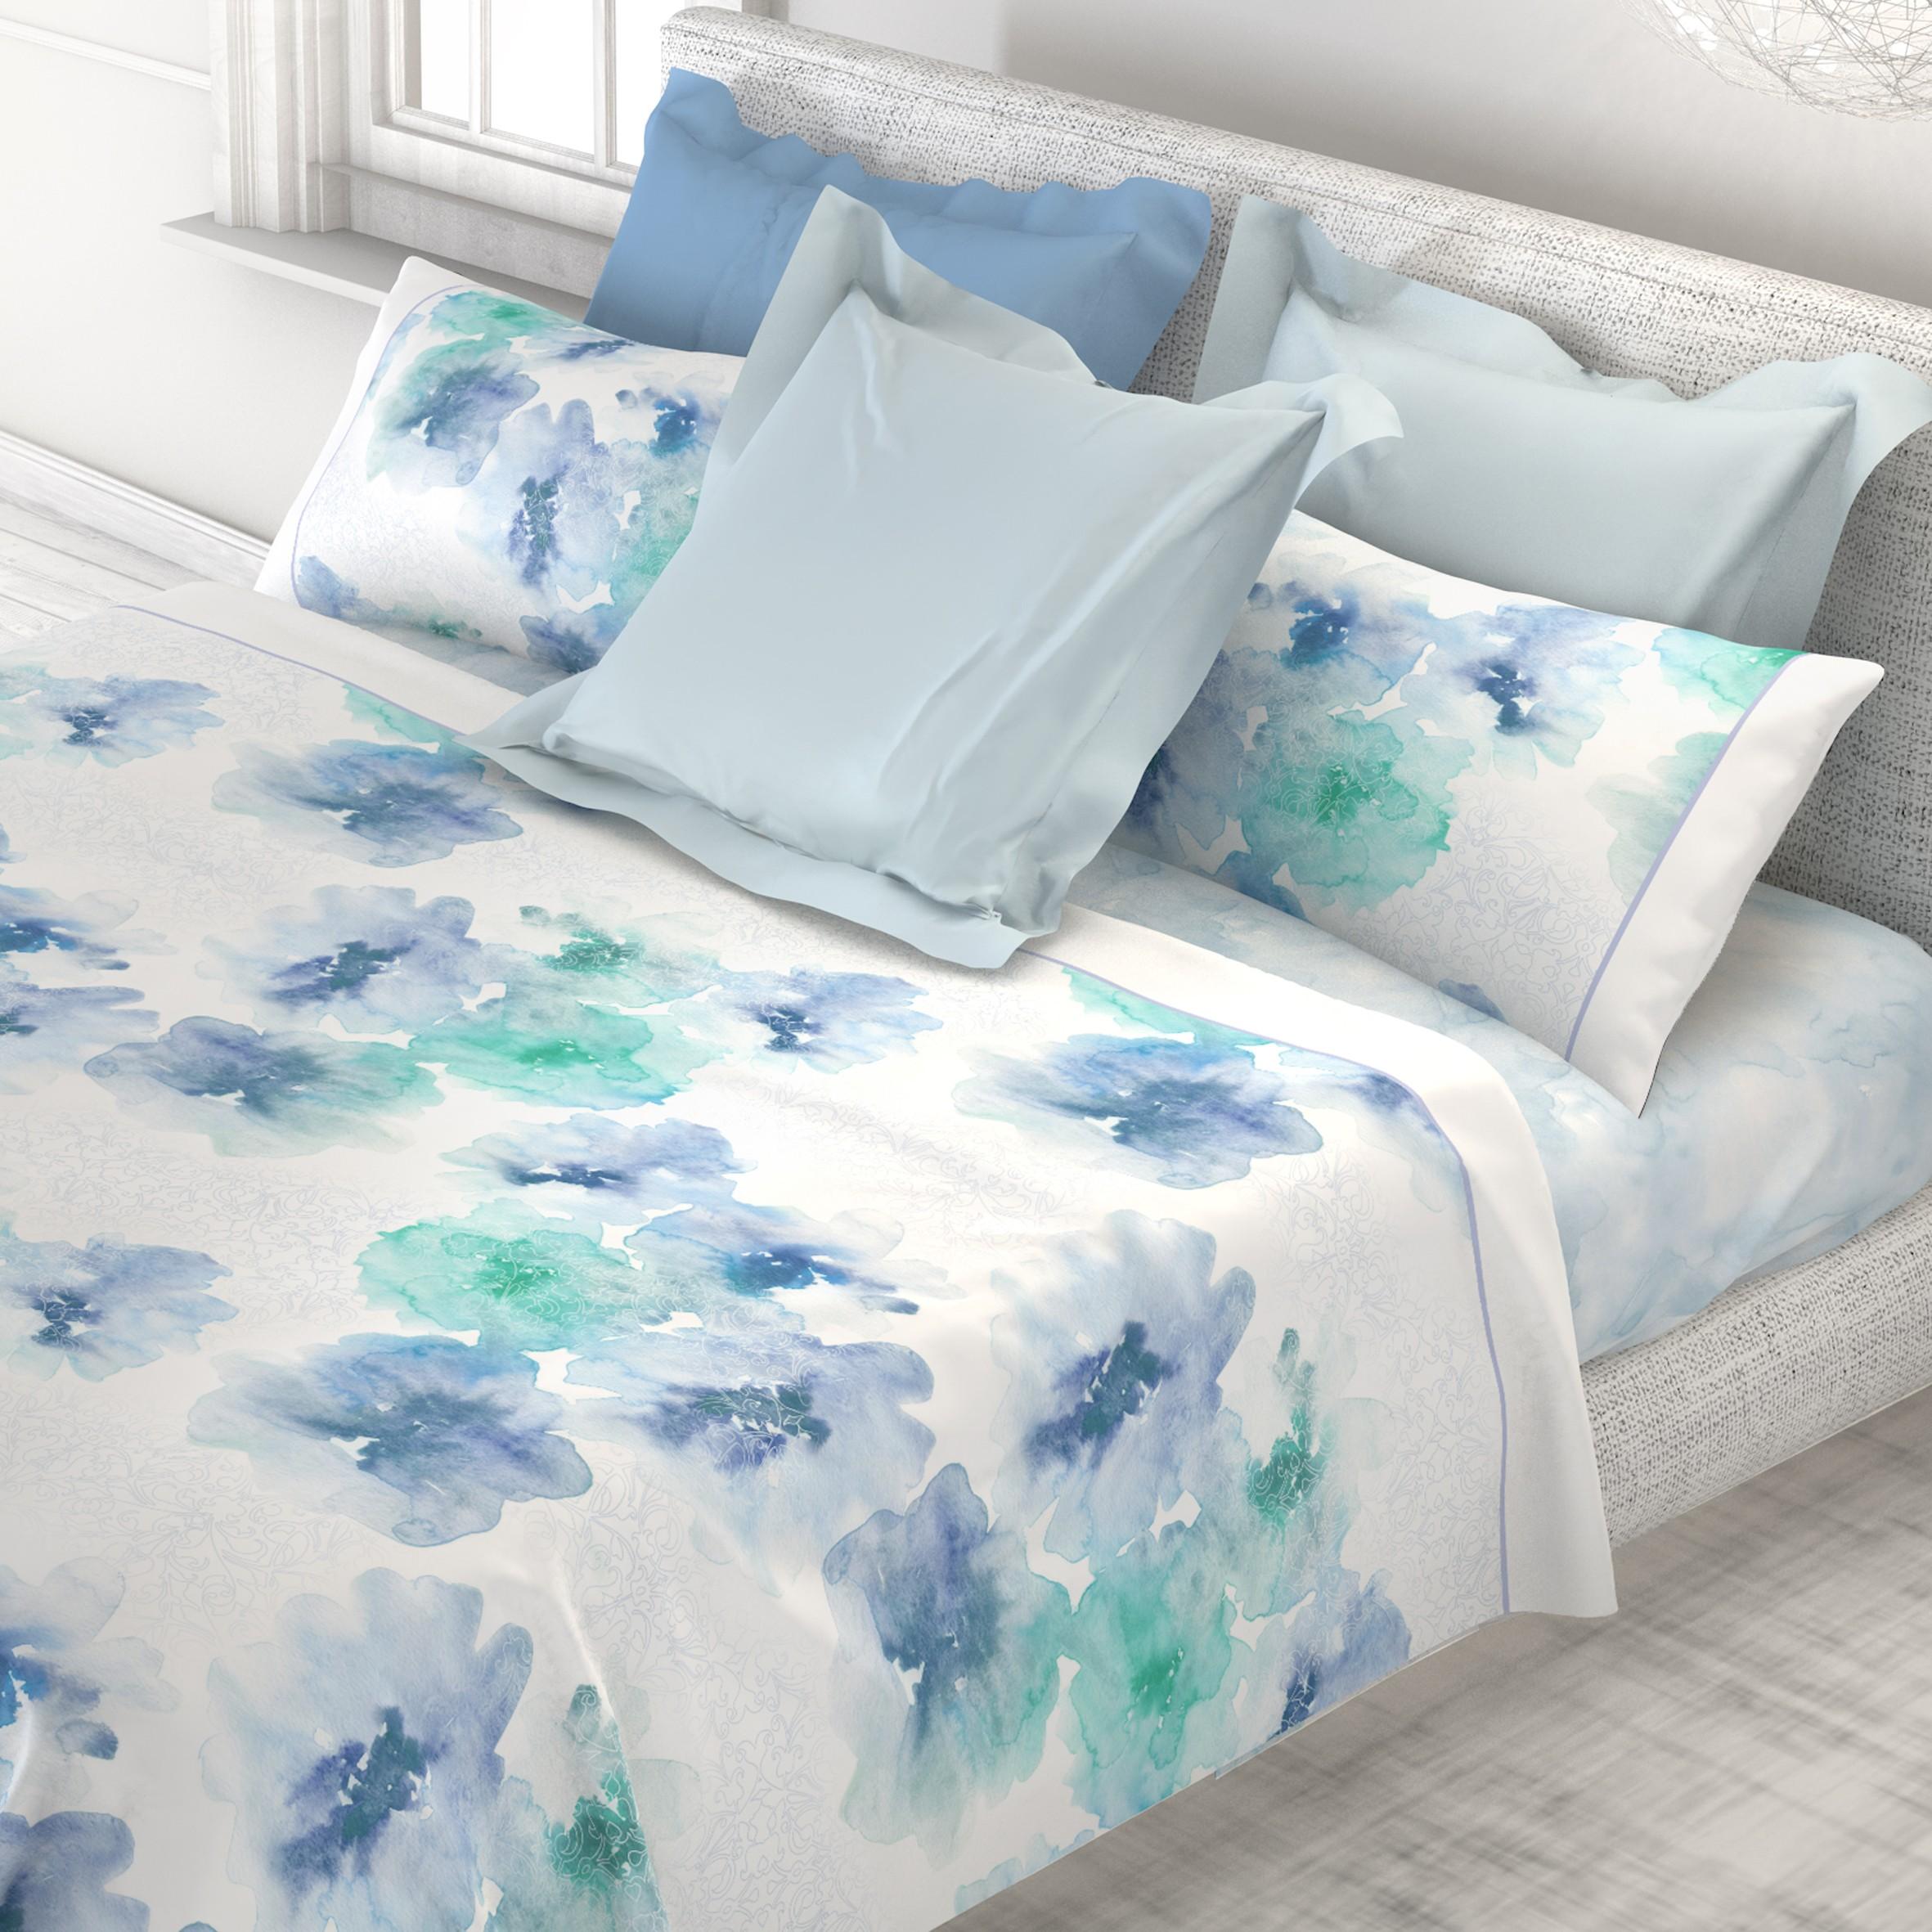 PV-20-201-1-506-lisboa-juego-sábanas-azul